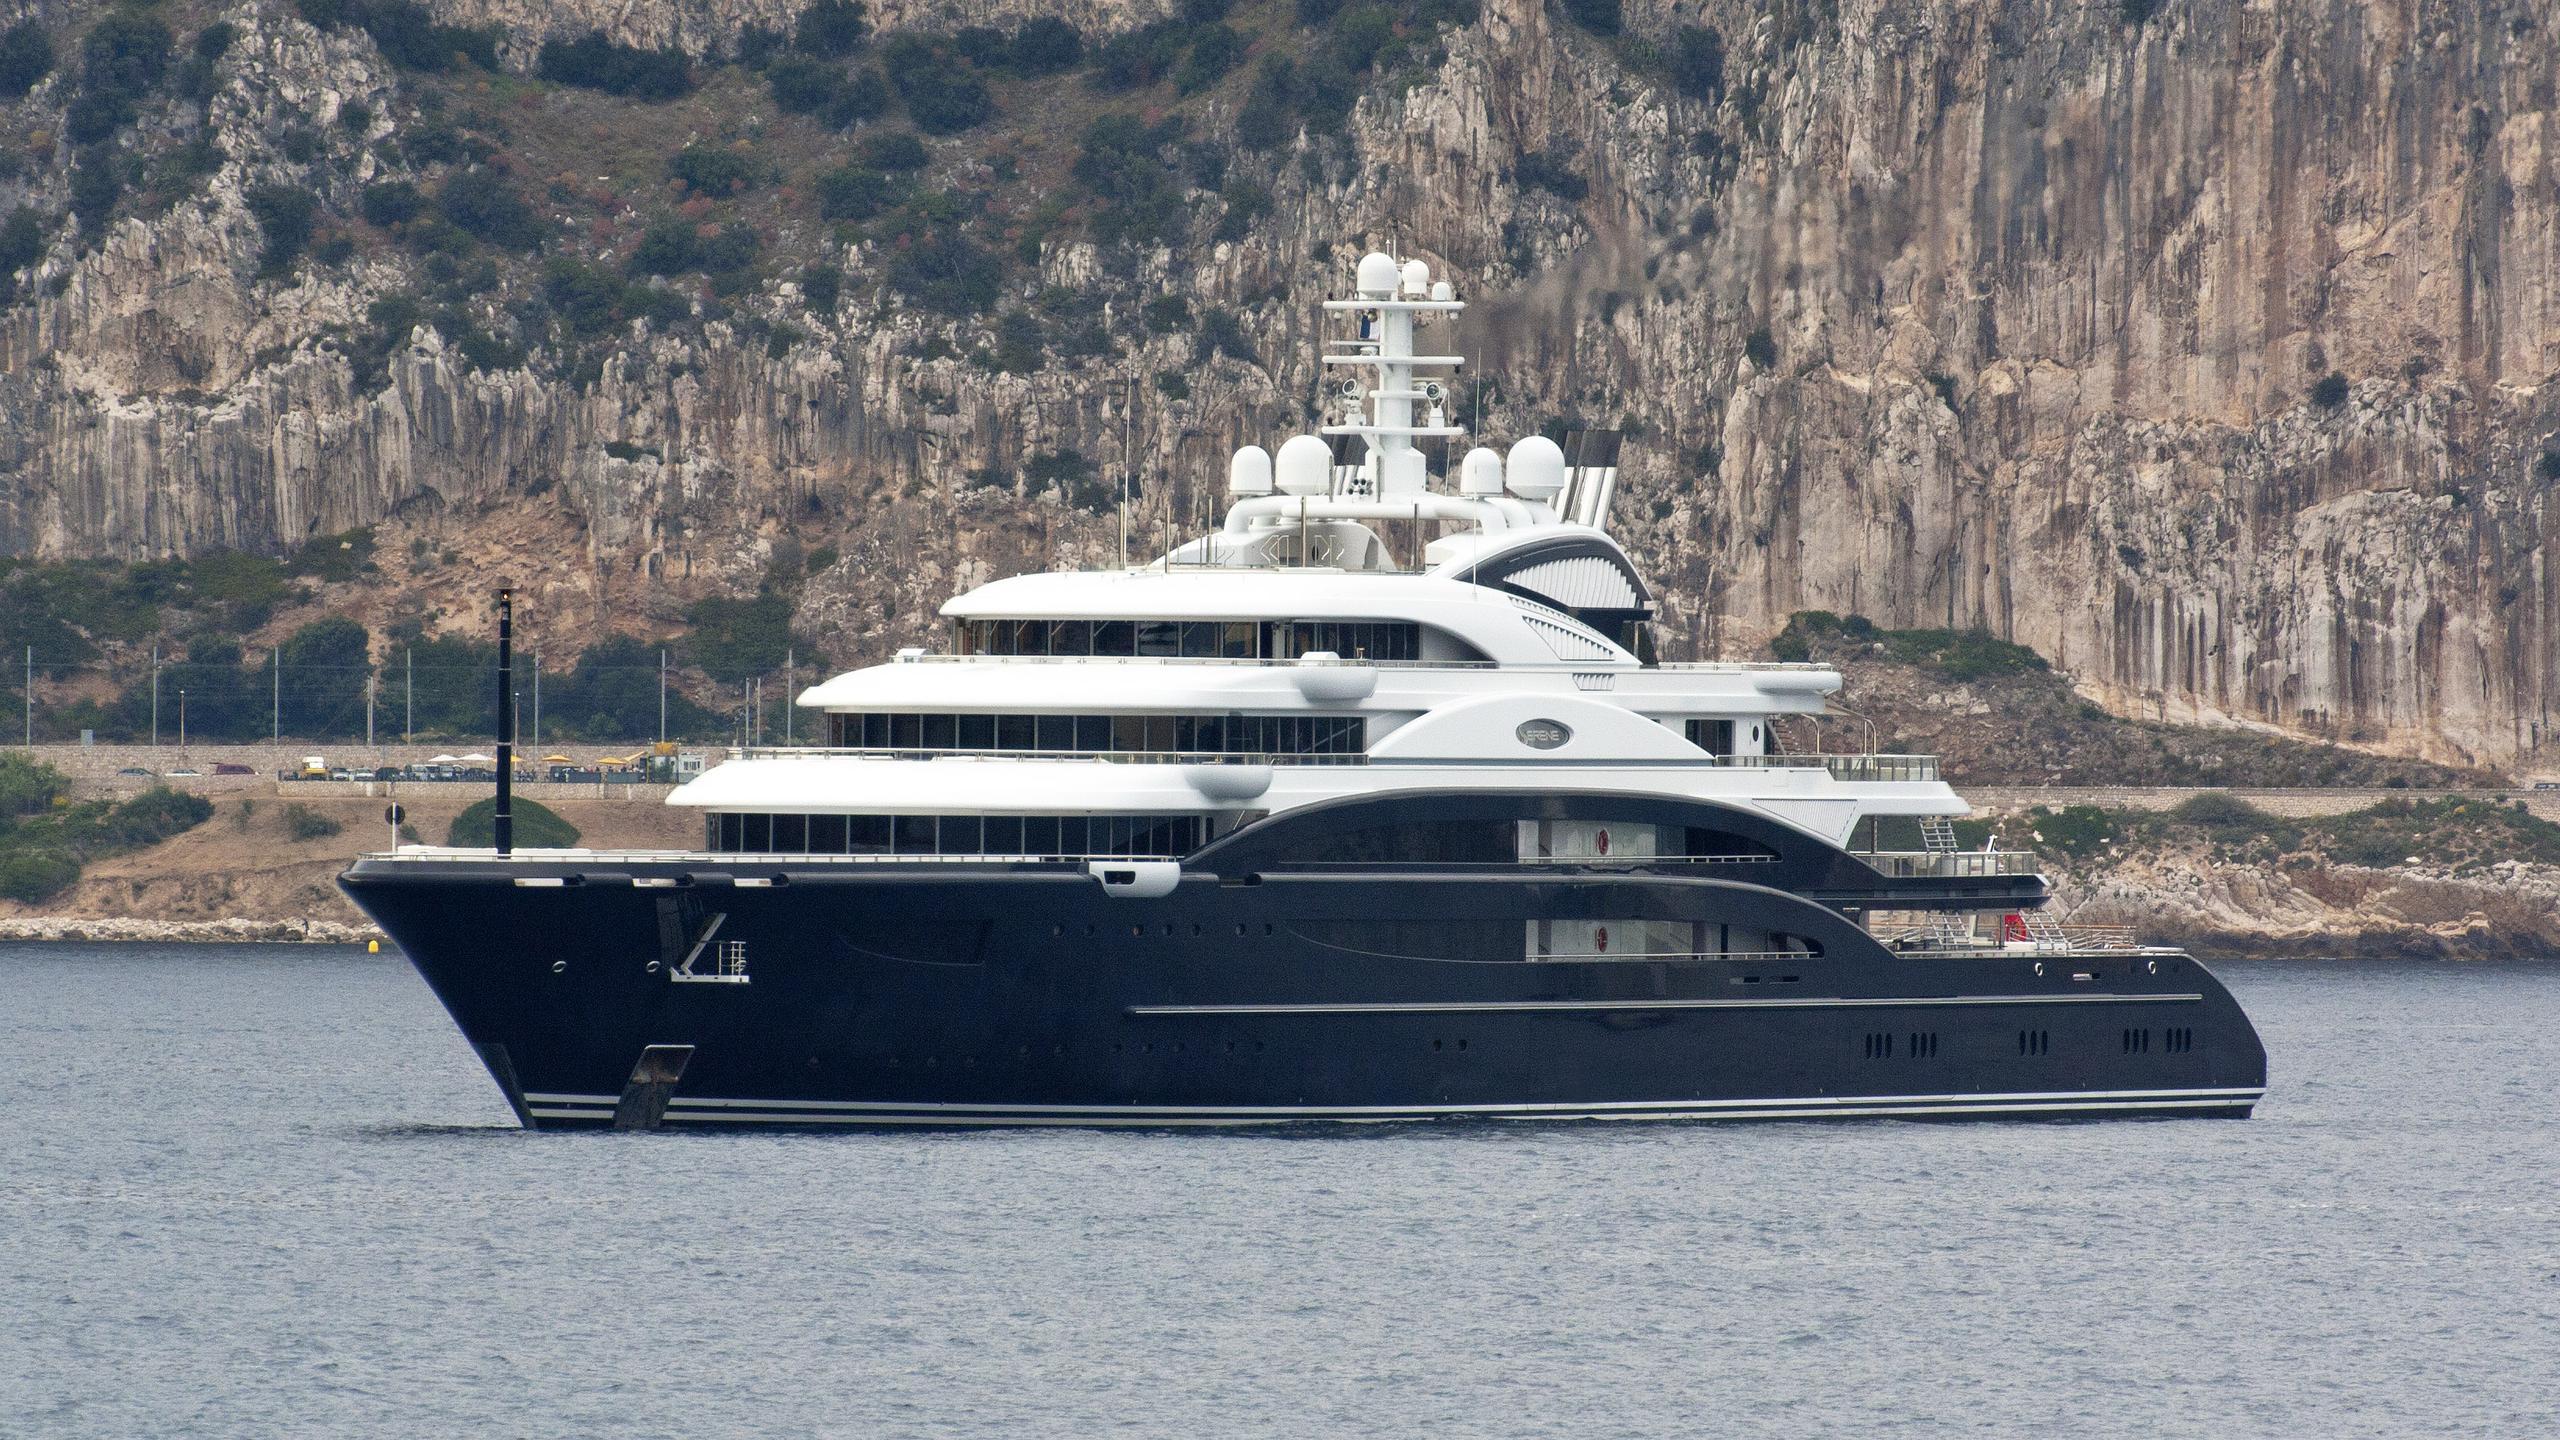 serene-motor-yacht-fincantieri-2011-134m-profile-1